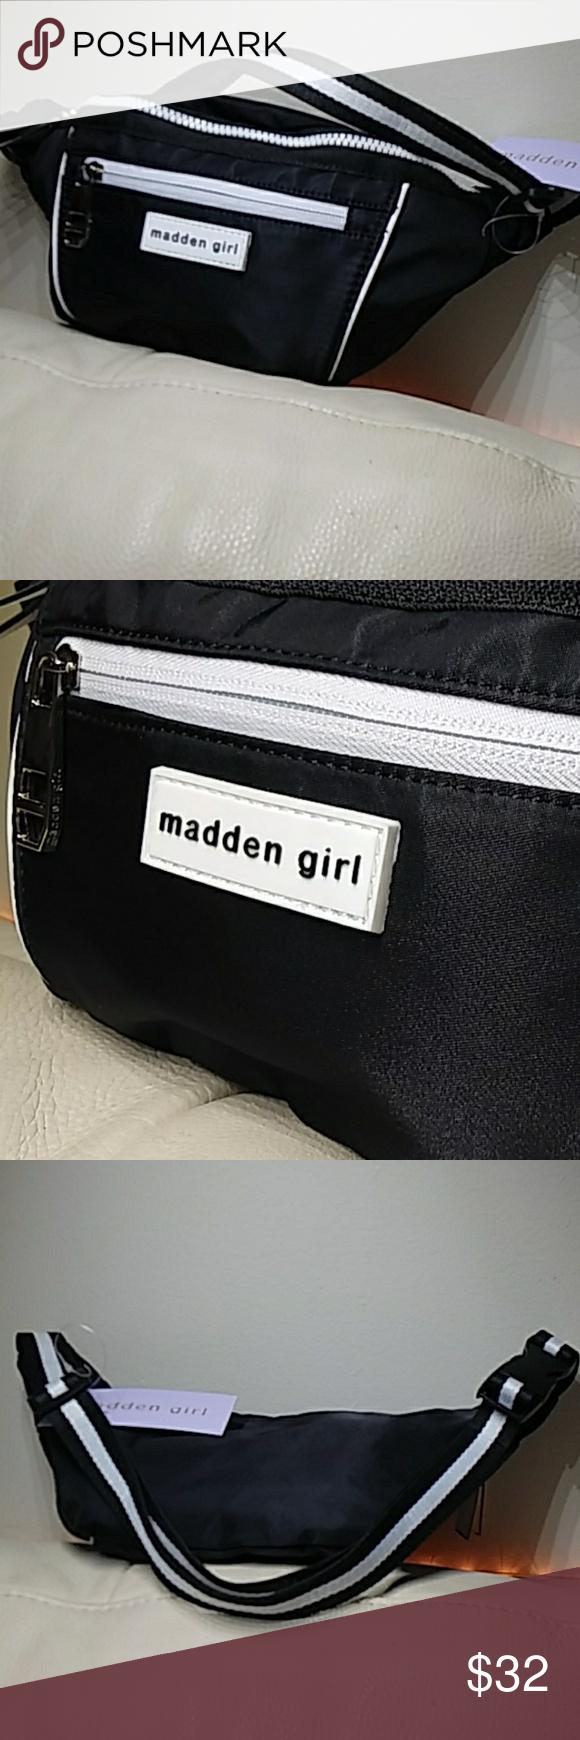 b11ffc1aa3d Madden Girl Belt Bag 2018-2019 Fashion Trends! Trendy black and ...